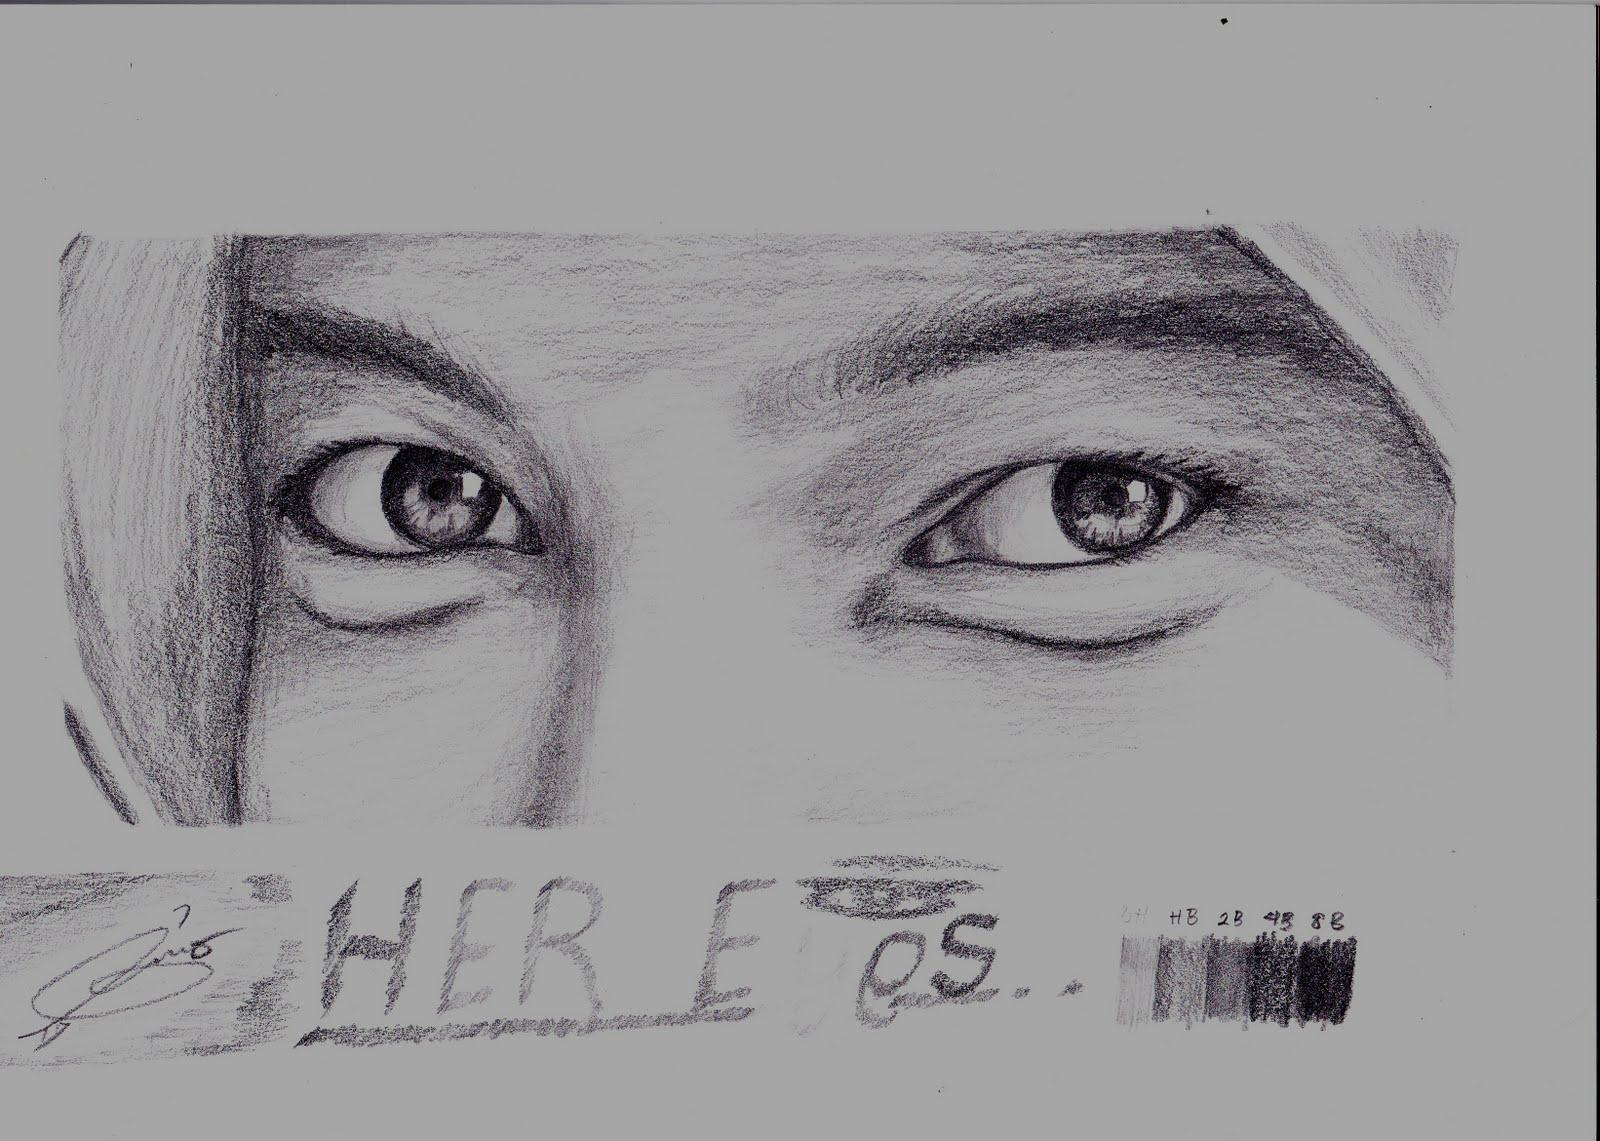 Pencil Draw / Scetch (Gambar Pensil / Sketsa